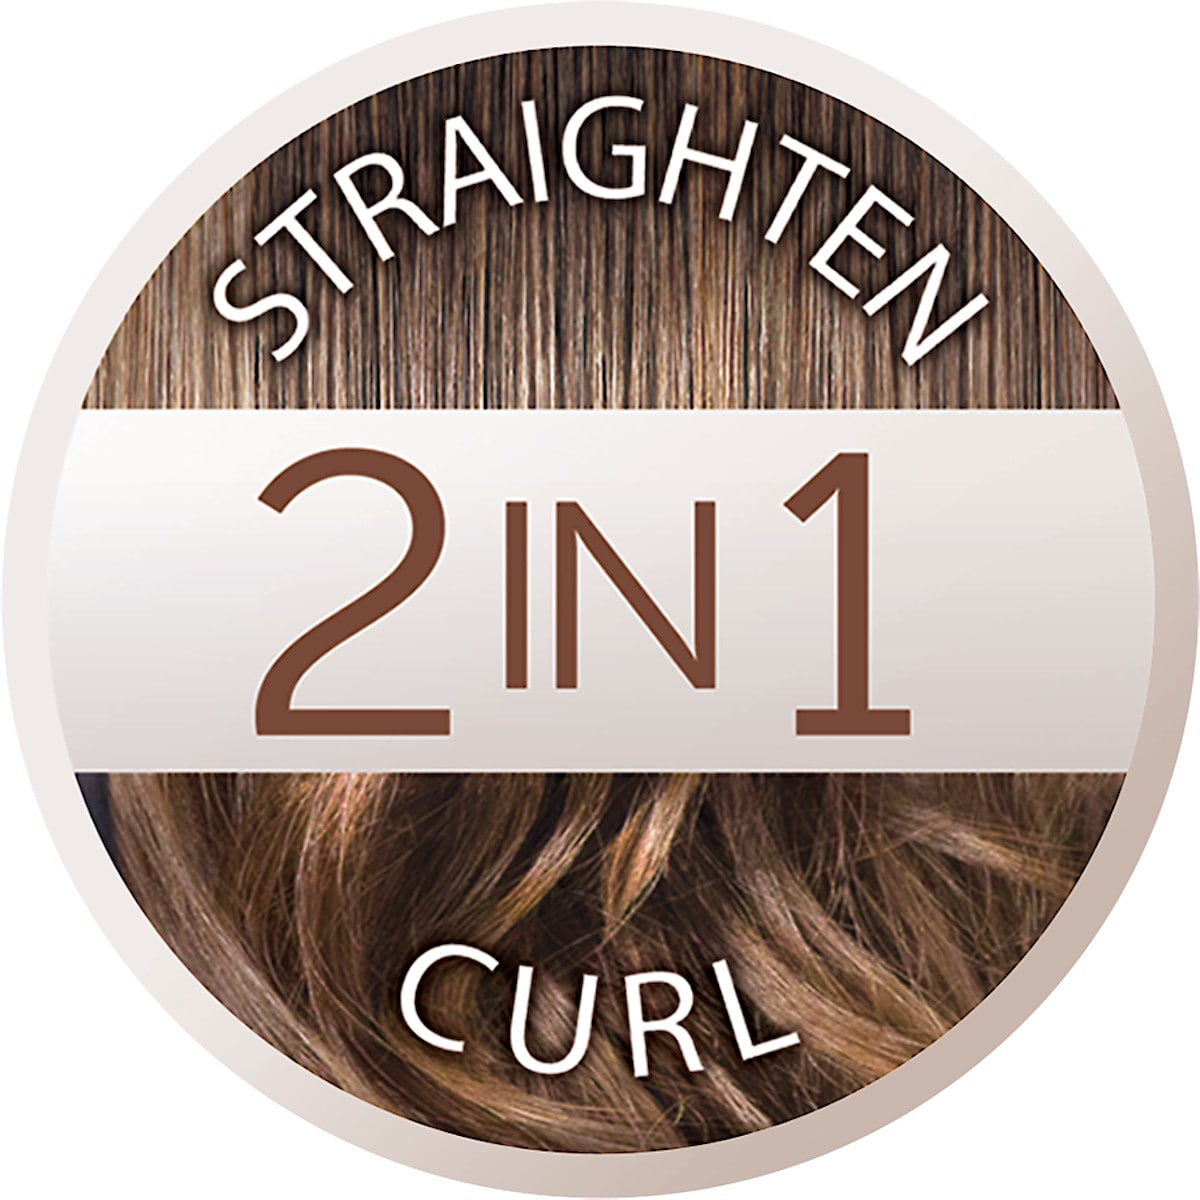 Remington Curl & Straight Confidence AS8606, varmluftsbørste